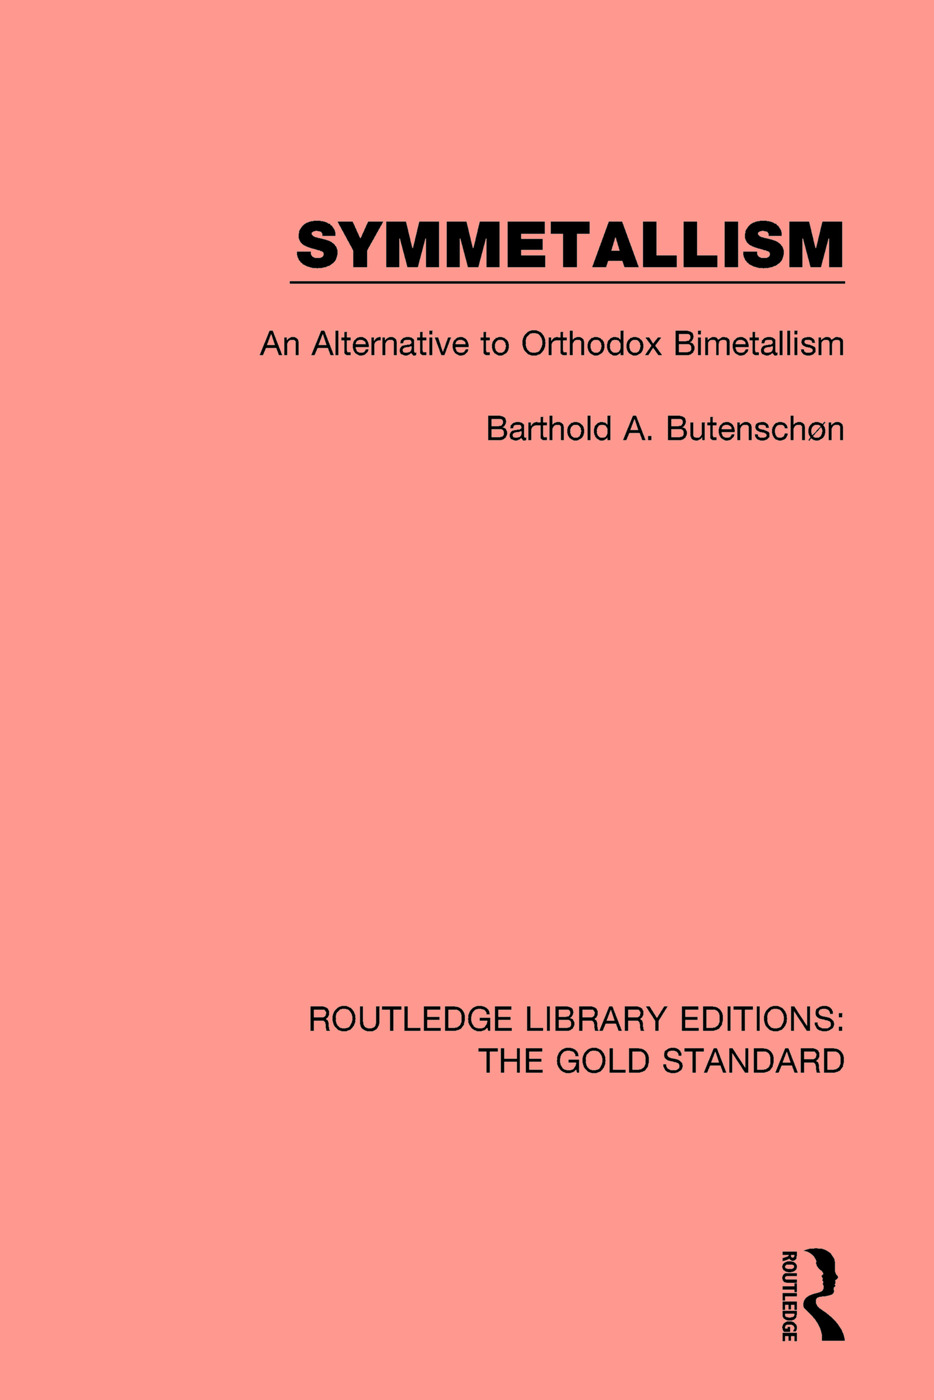 Symmetallism: An Alternative to Orthodox Bimetallism book cover